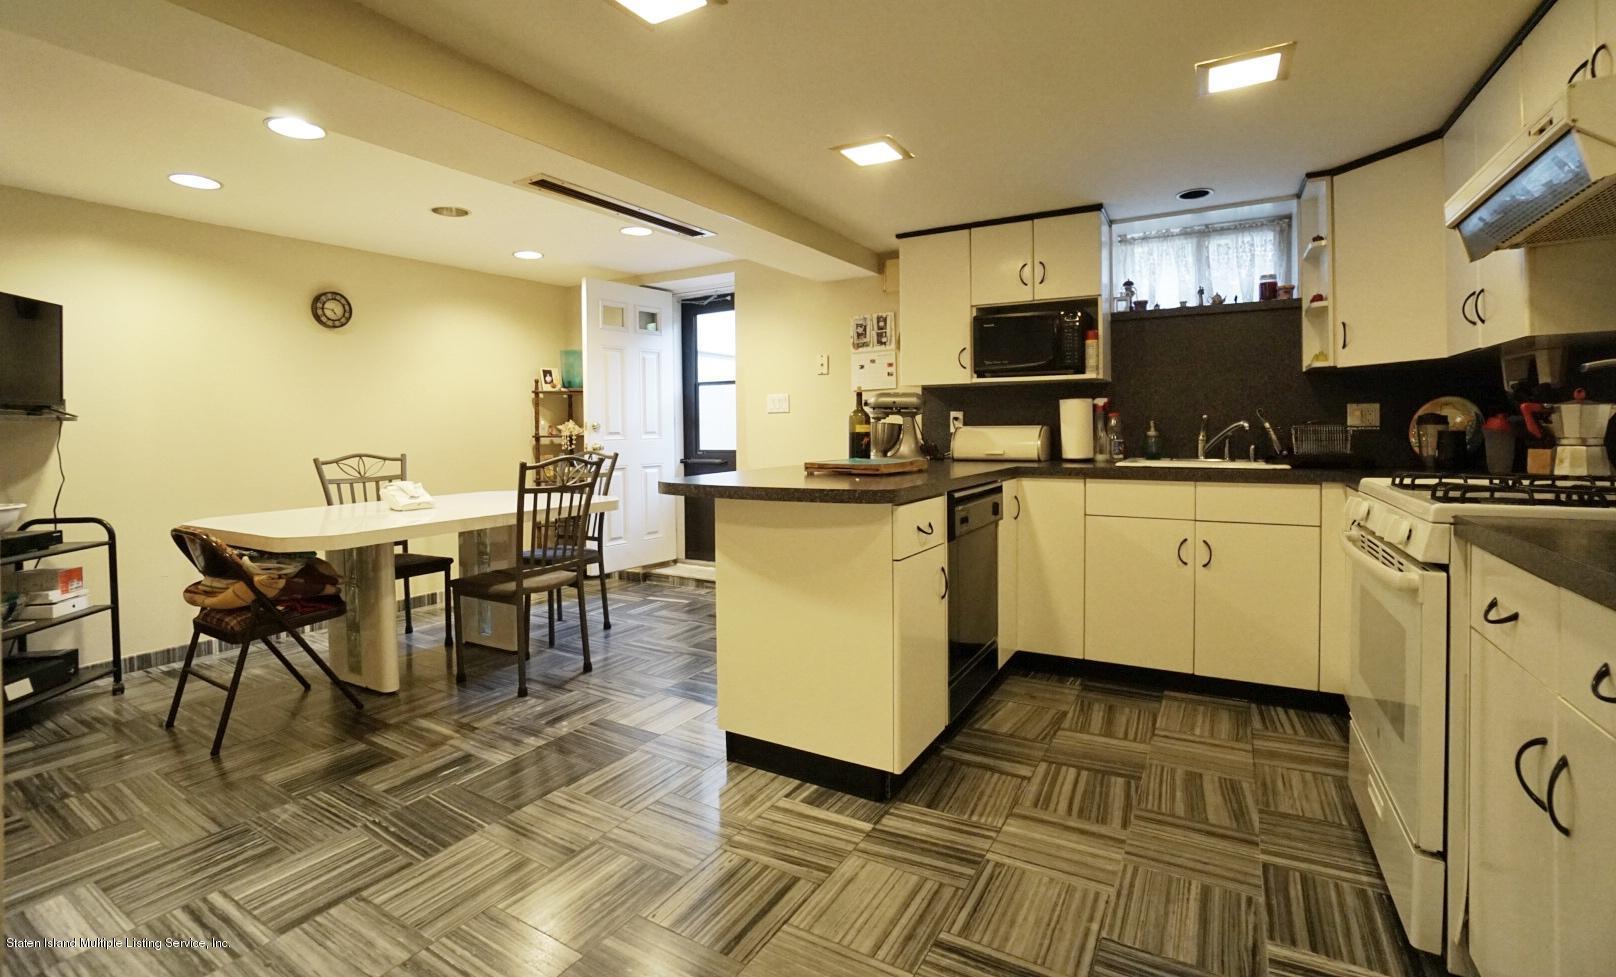 2107 73rd Street,Brooklyn,New York,11204,United States,5 Bedrooms Bedrooms,5 Rooms Rooms,3 BathroomsBathrooms,Residential,73rd,1132990